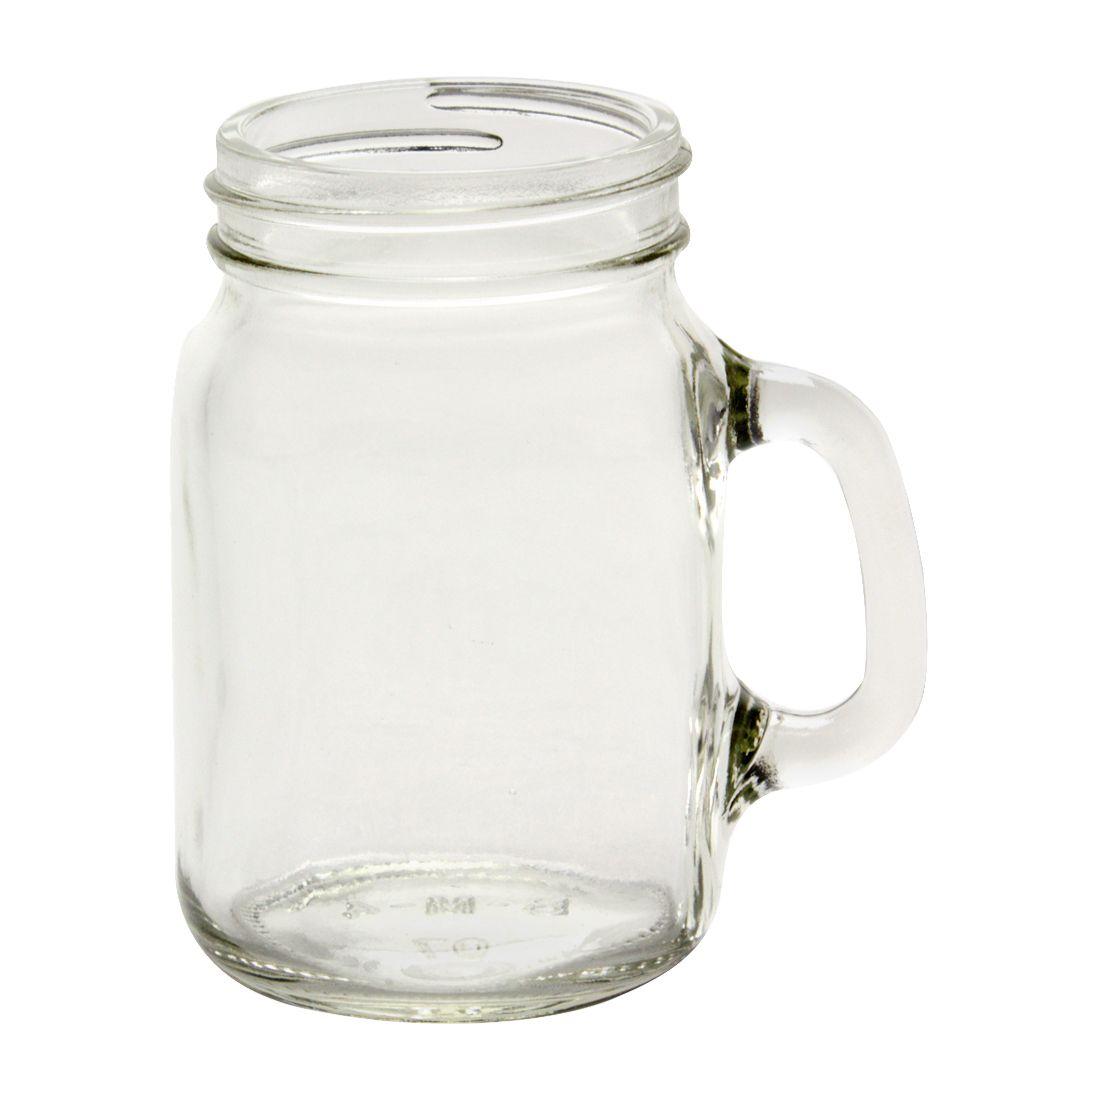 4 Oz Small Mason Jars With Handles Mini Mugs With 48 400 Finish Mason Jars With Handles Small Mason Jars Mason Jar Mugs